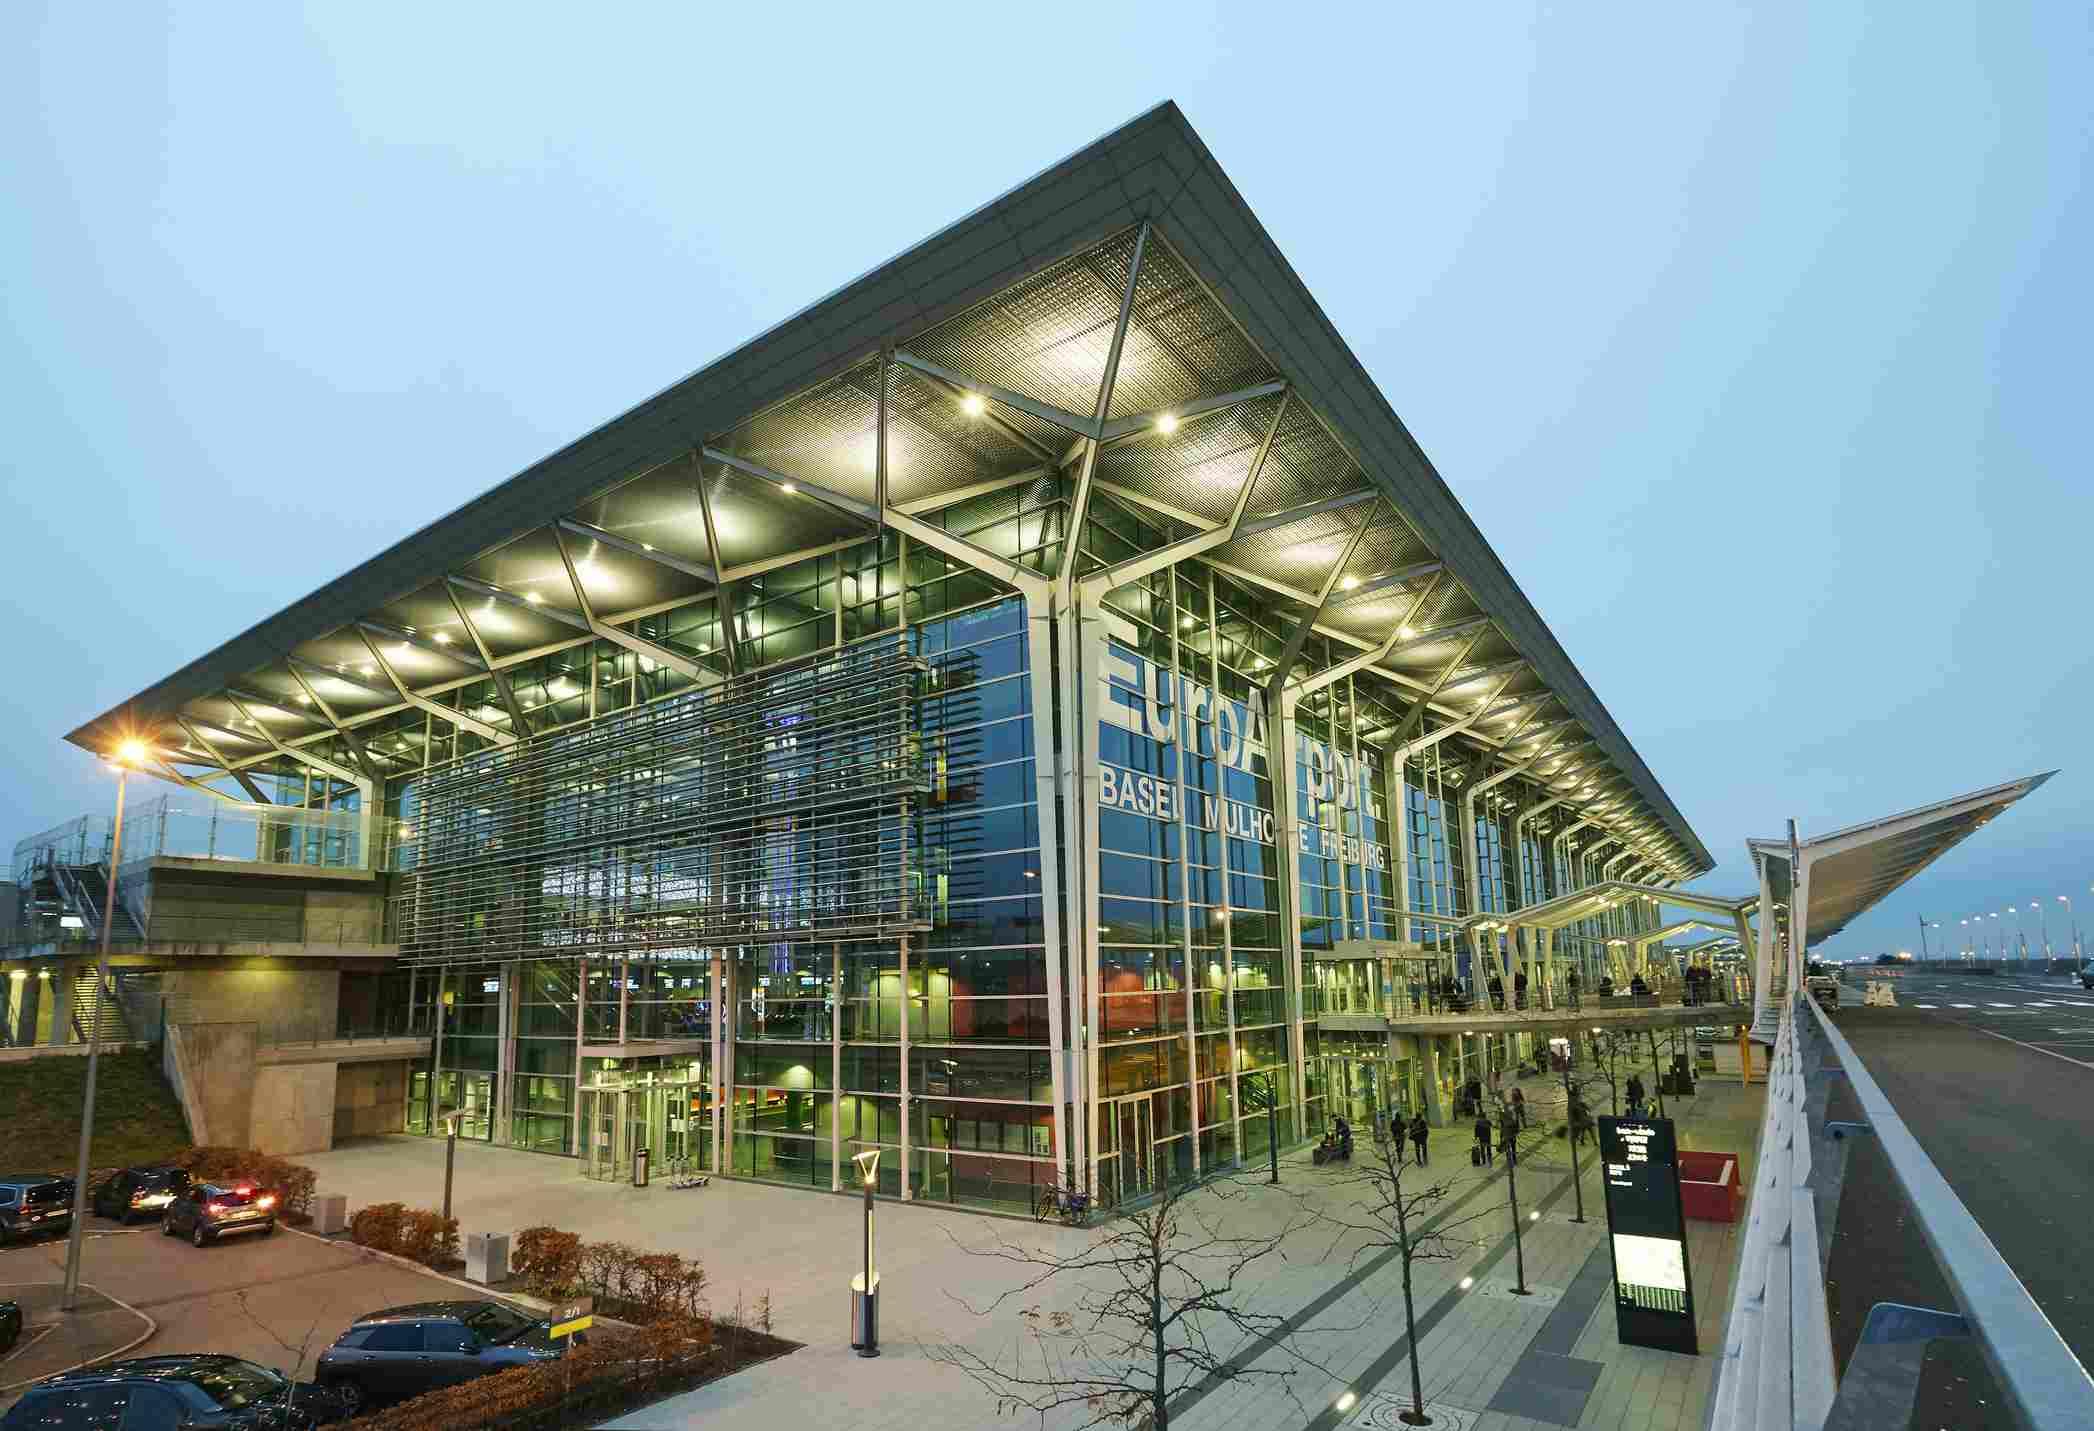 Euro Airport Basel